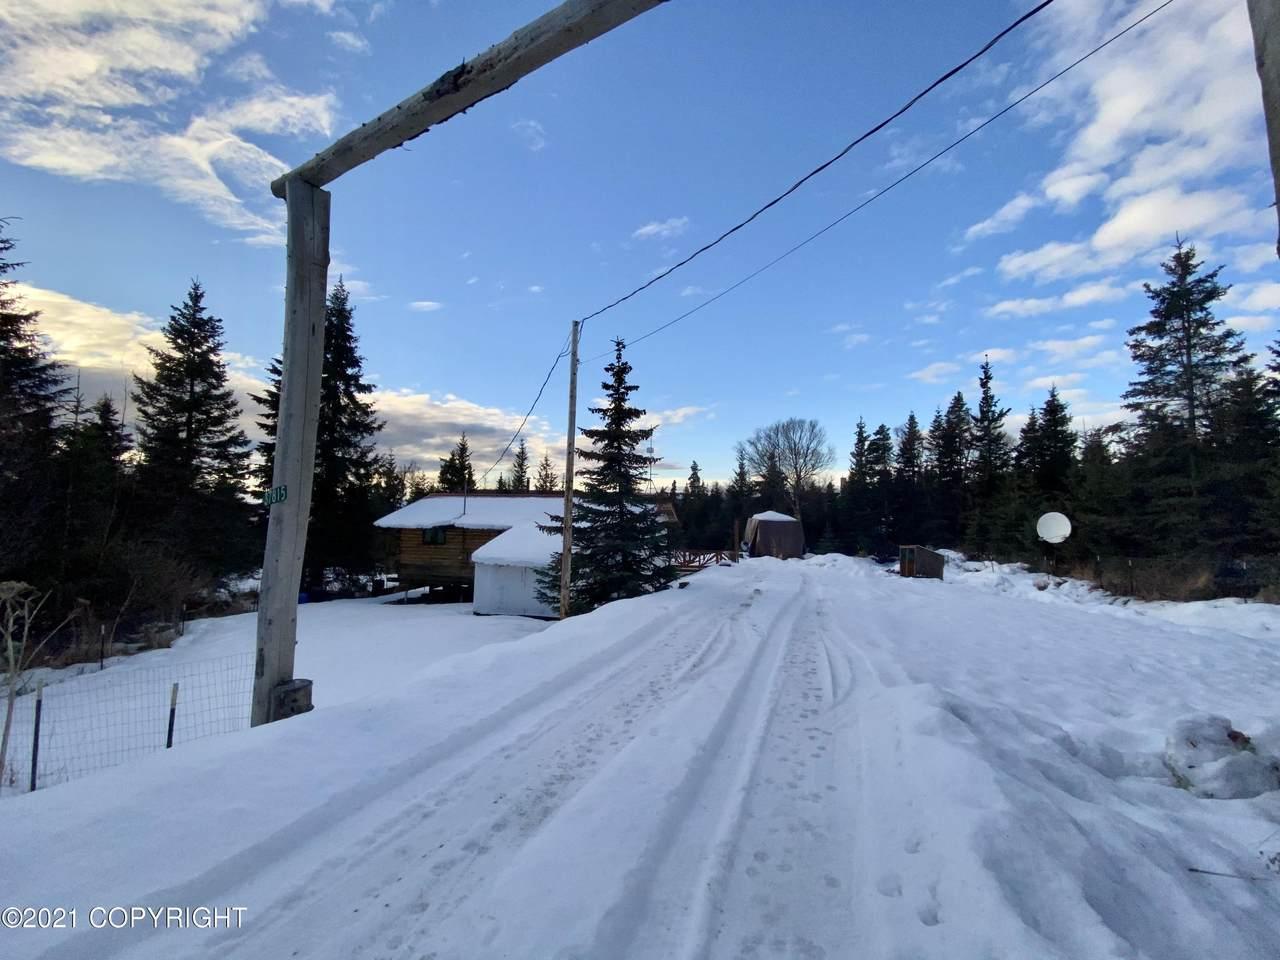 https://bt-photos.global.ssl.fastly.net/alaska/1280_boomver_1_21-874-2.jpg